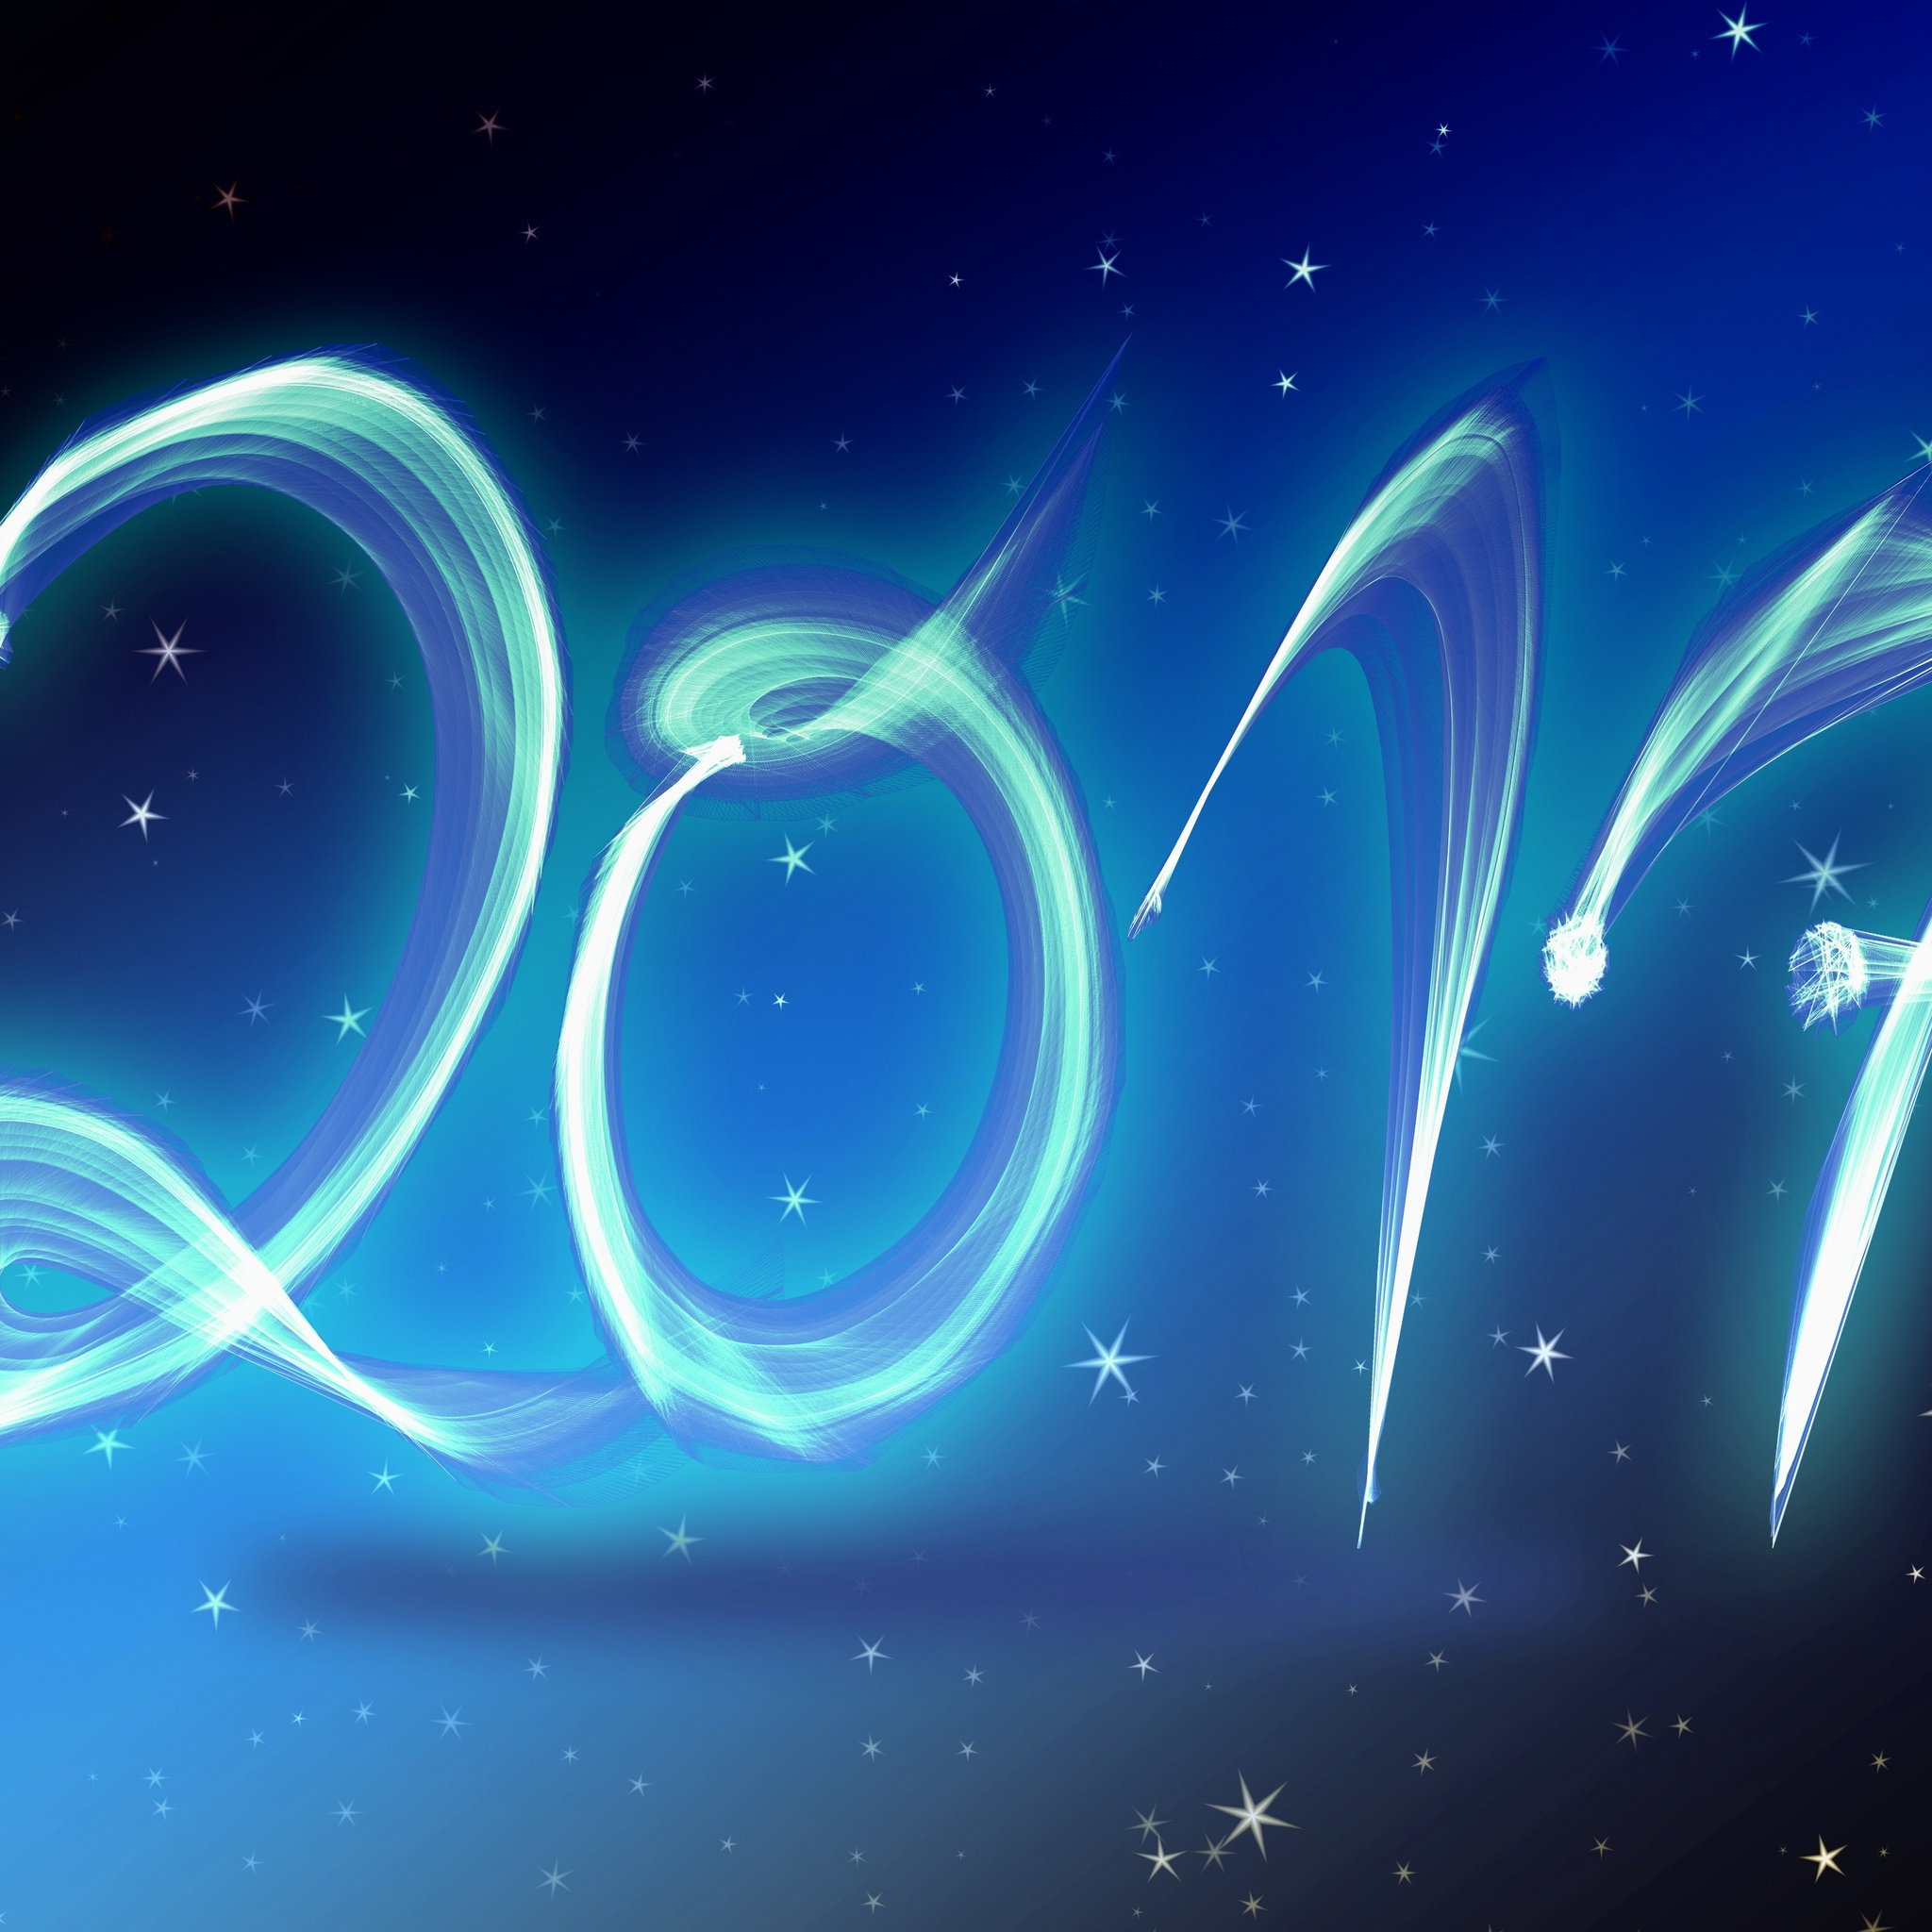 happy-new-year-2017-5k-4k.jpg